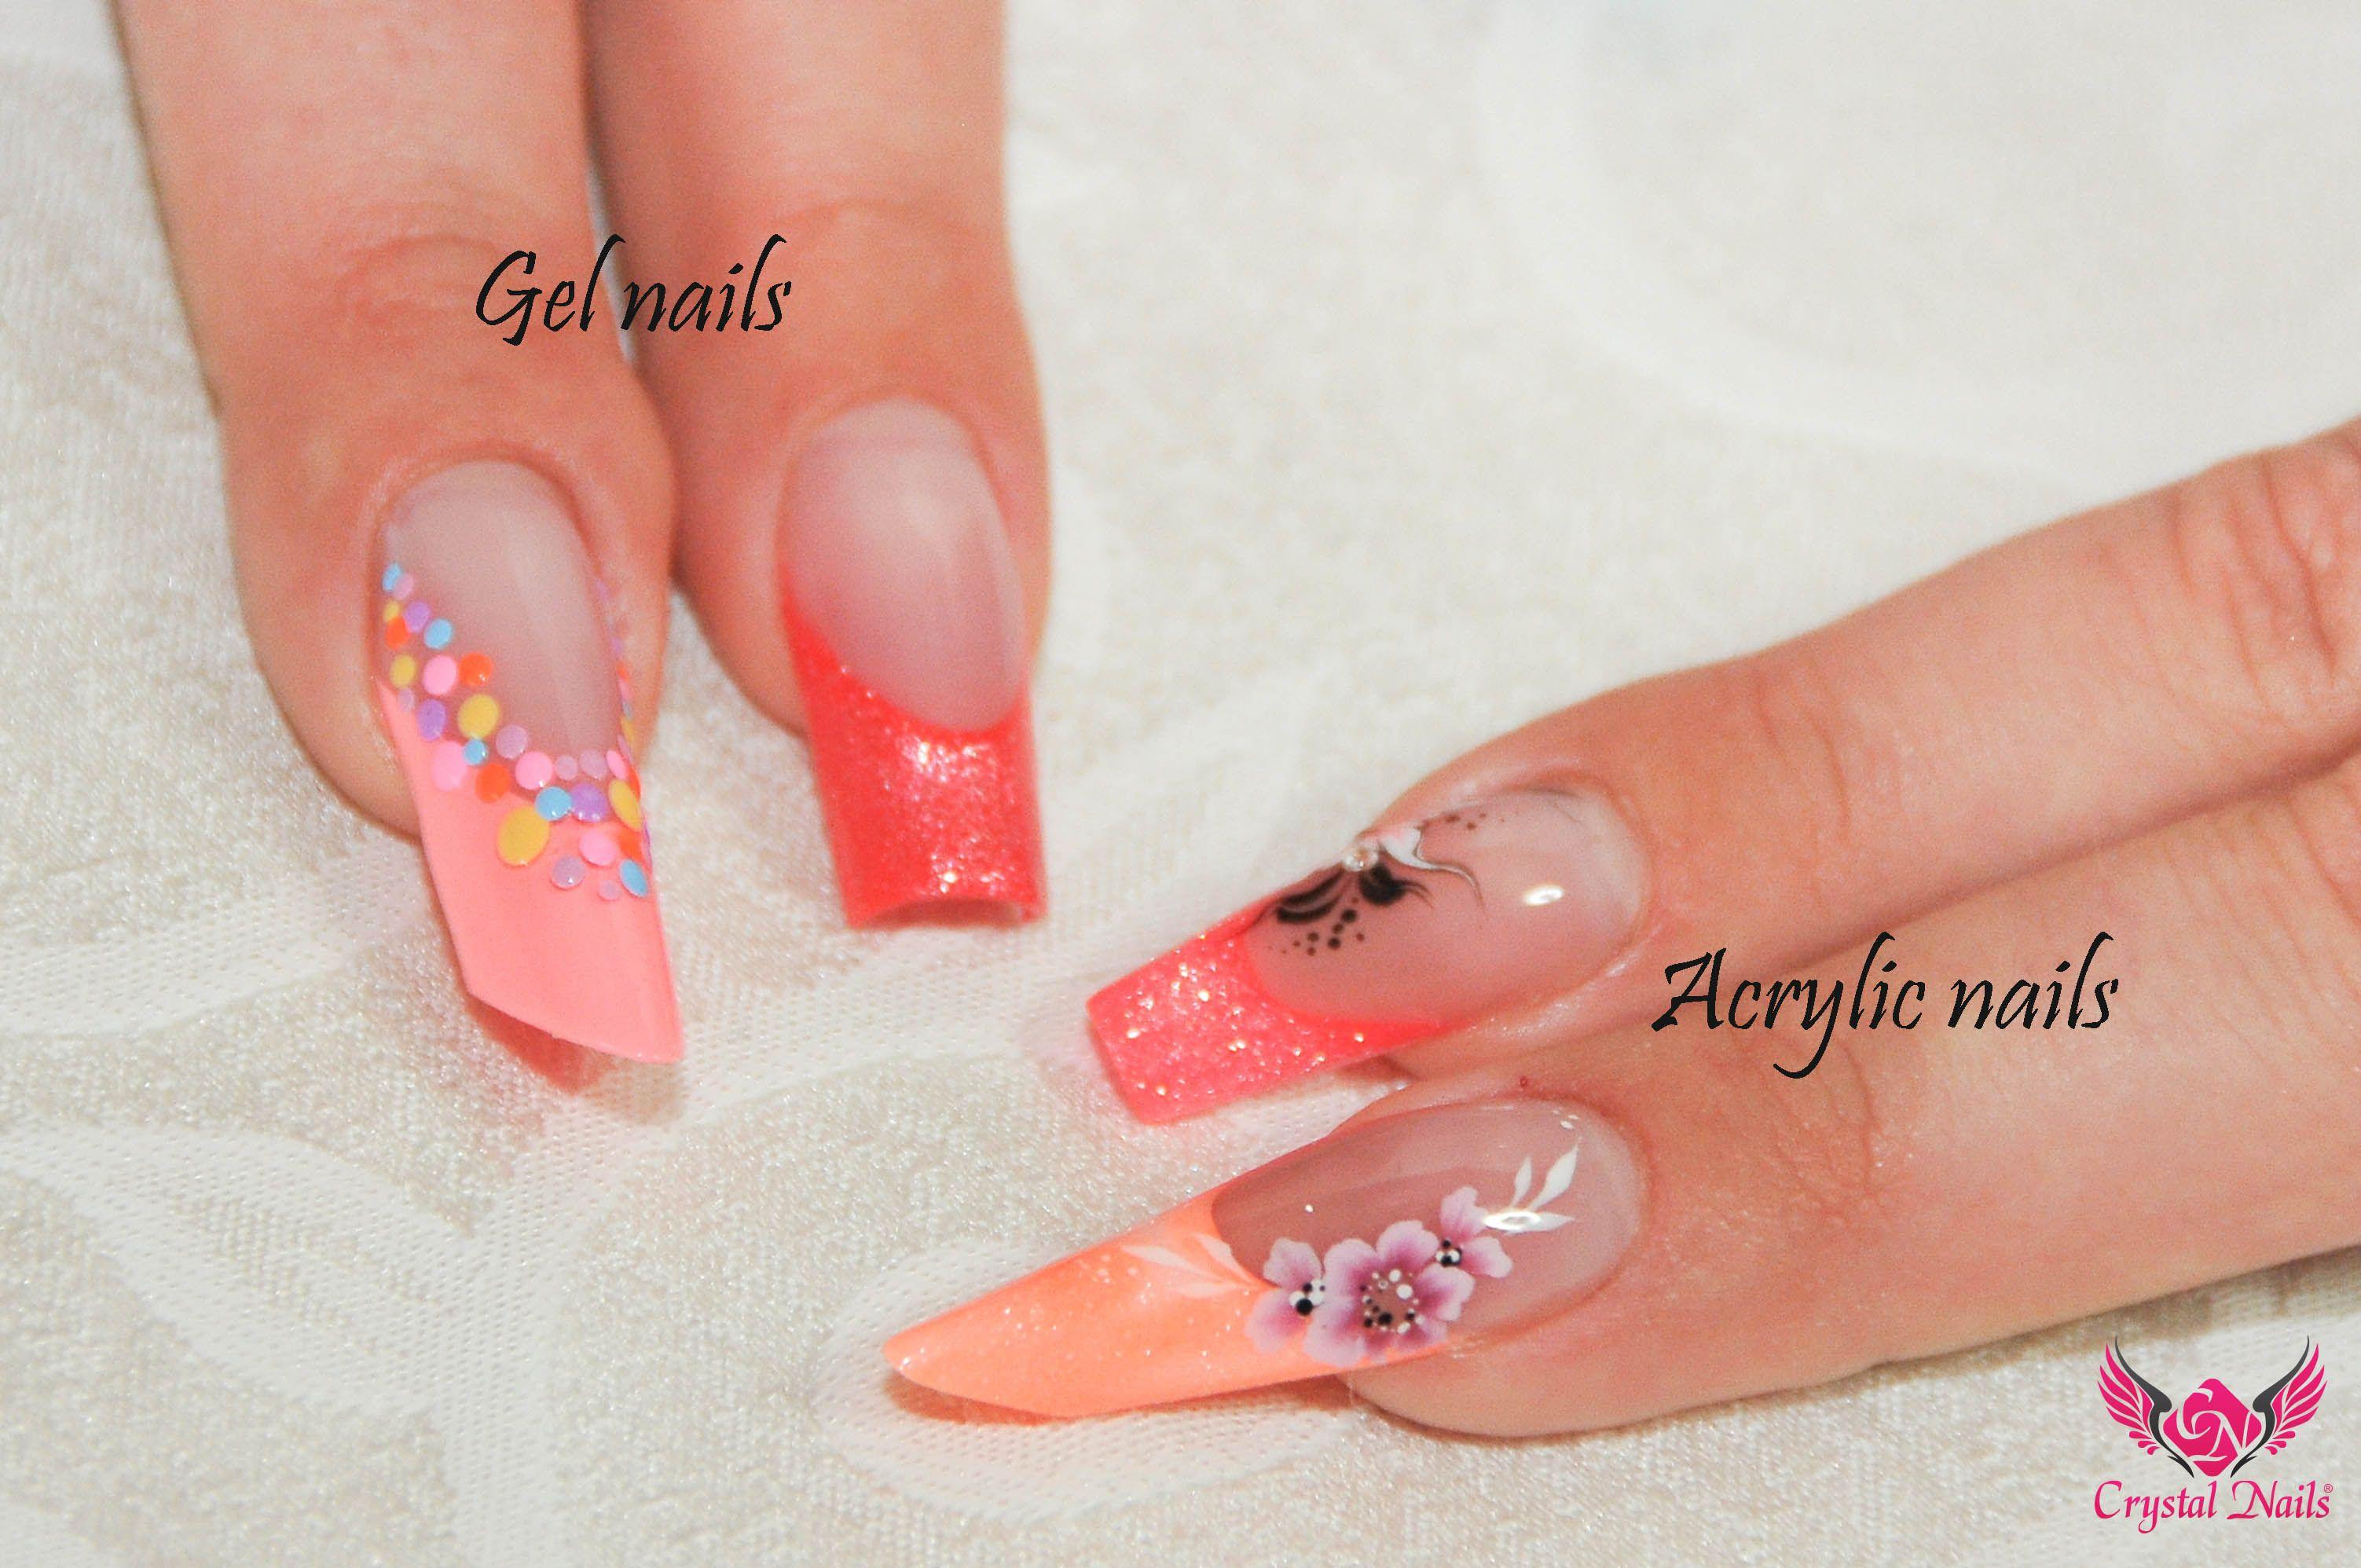 gel nails vs. #acrylic #nails | Variations on a theme | Pinterest